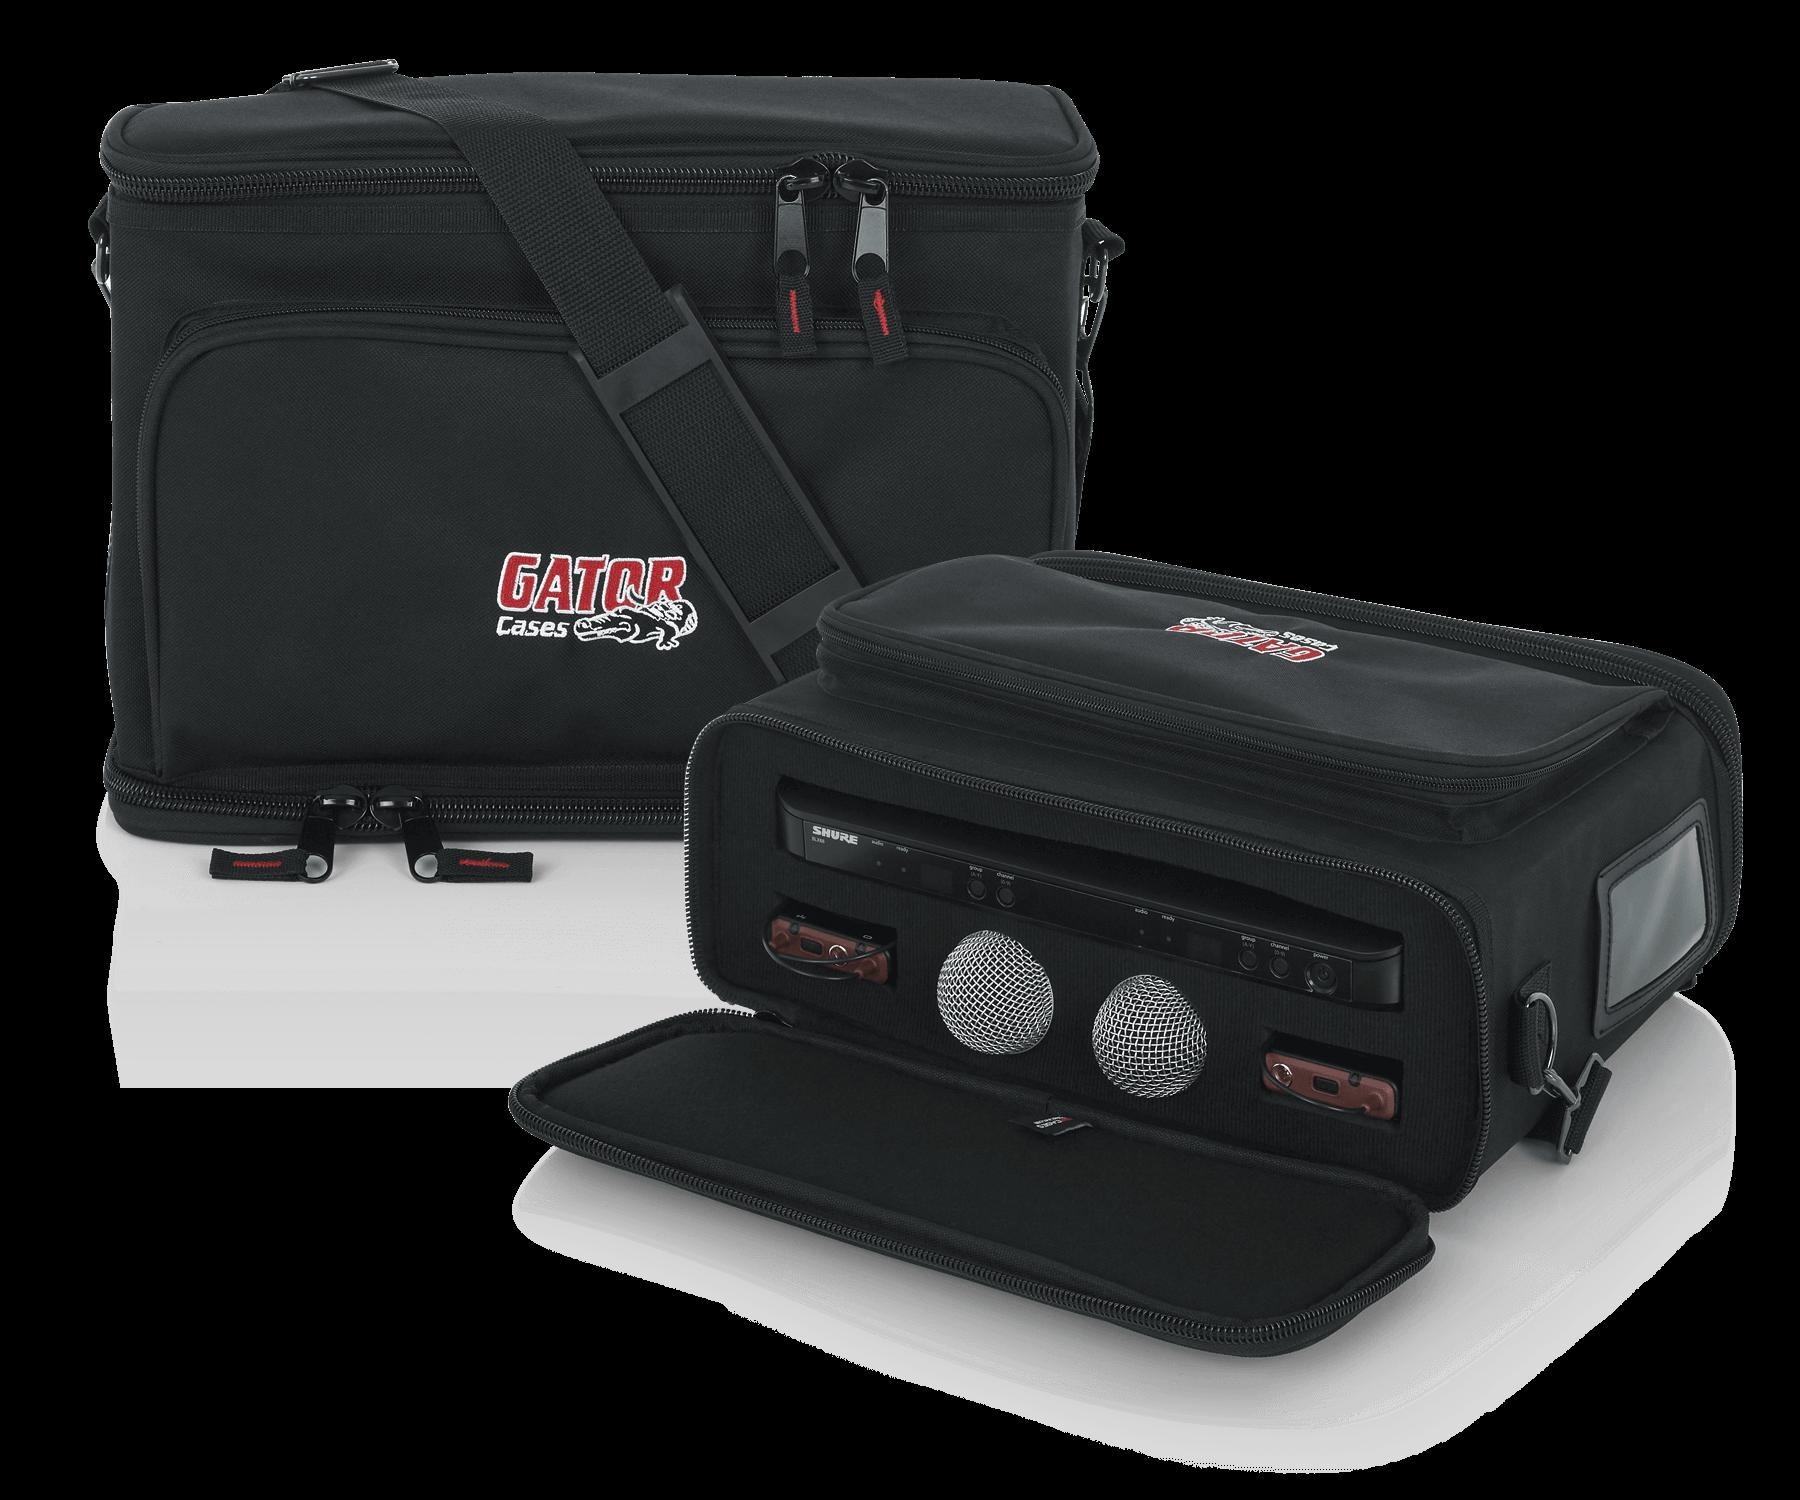 Gator Cases Music Instruments Pro Audio A V Video Utility Fender Super Reverb Speaker Wiring Diagram Releases Bag Designed For Shure Blx Or Similar Wireless Systems